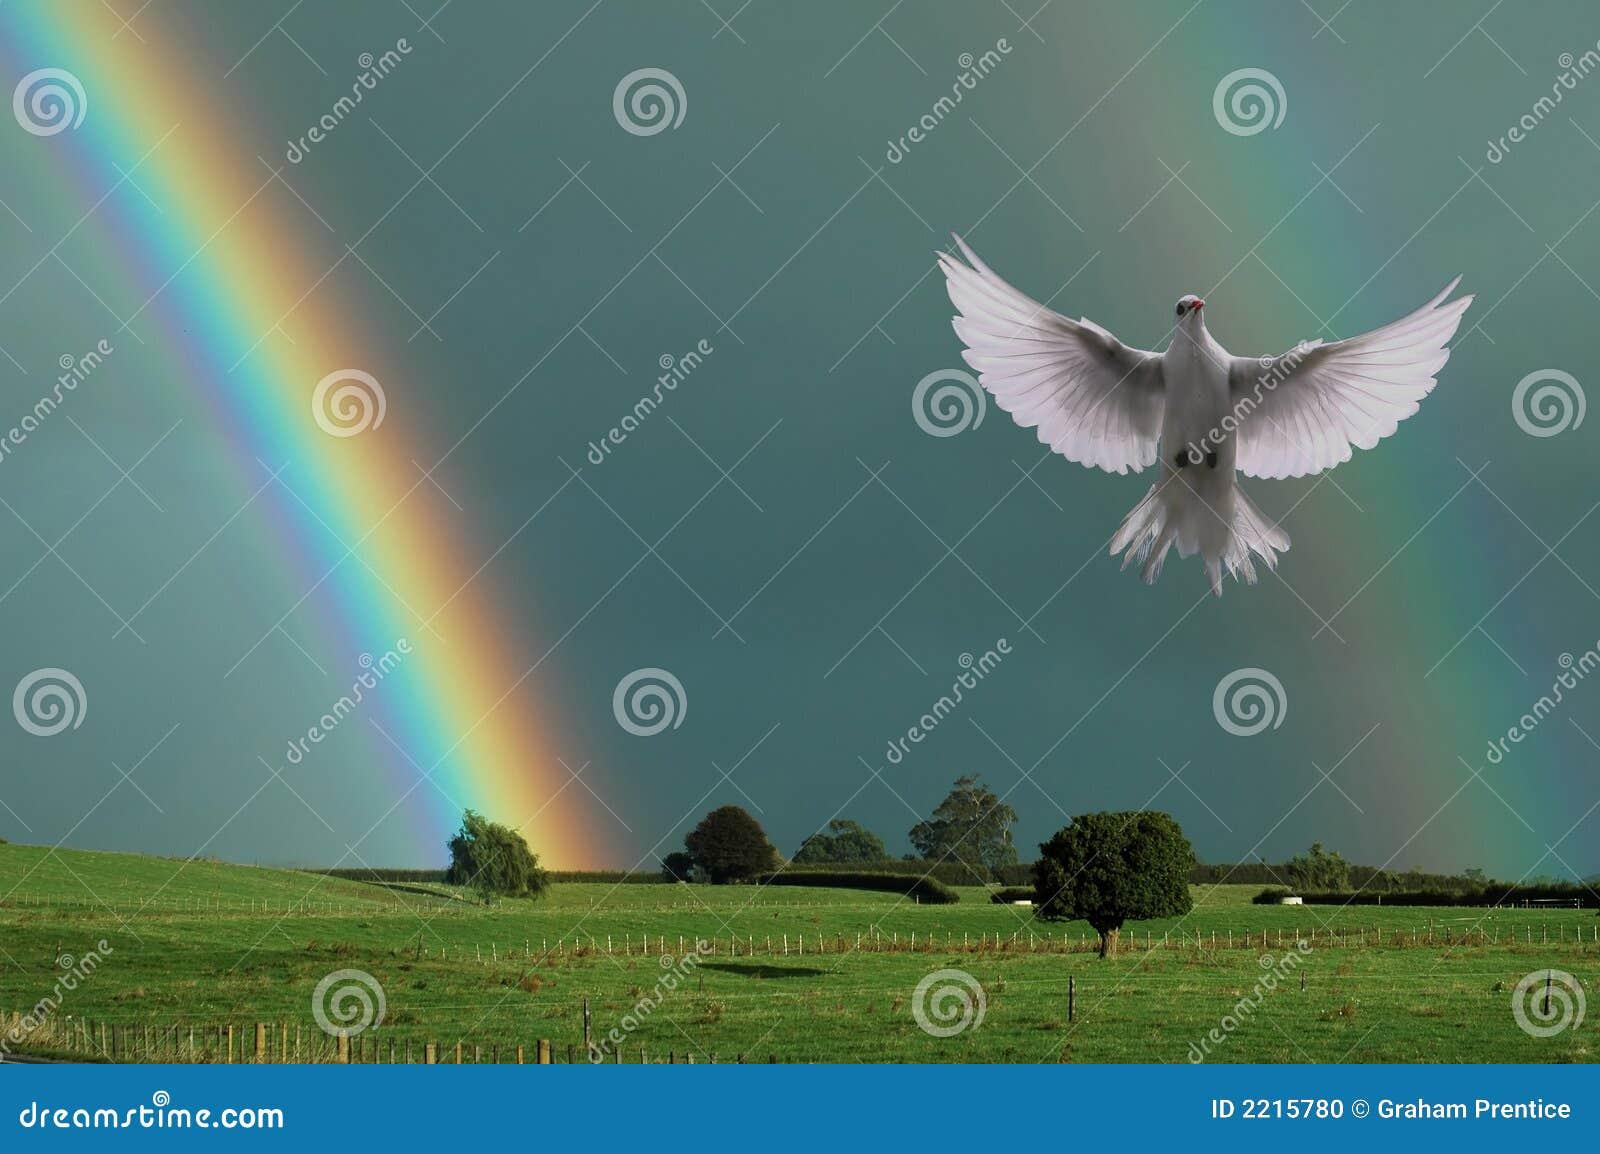 Rainbow and the Dove